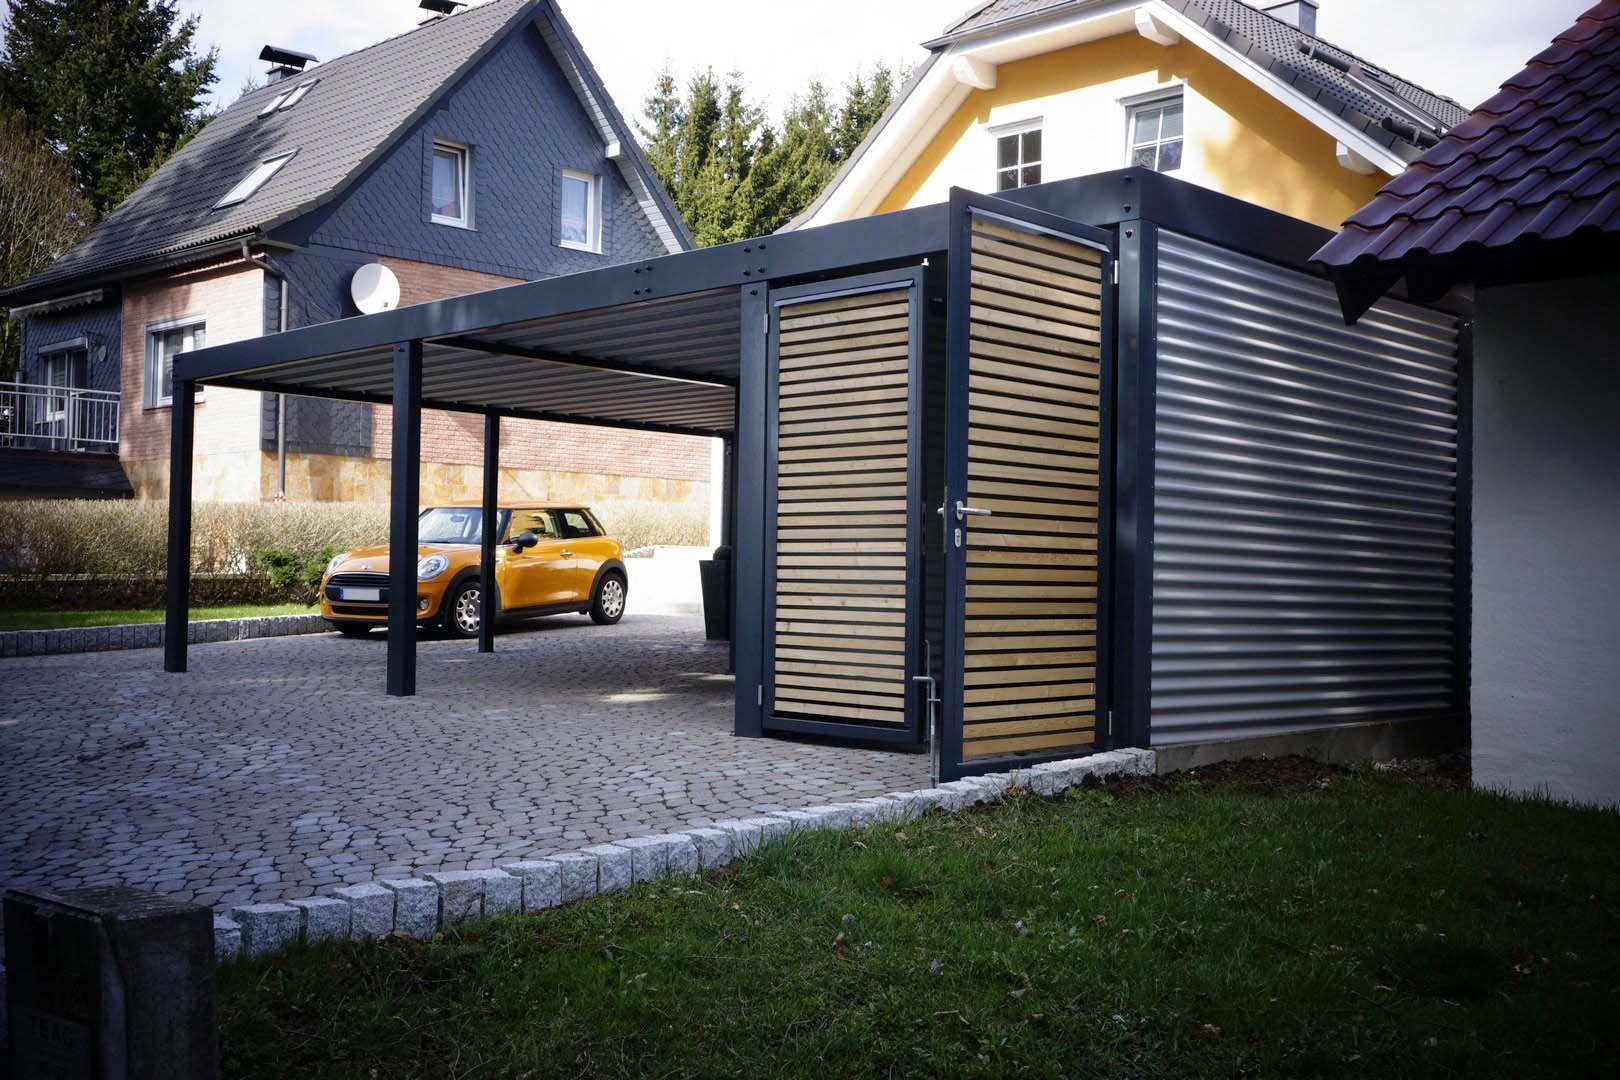 Metallcarport-Stahlcarport-Kaufen-Metall-Carport-Preise-Mit